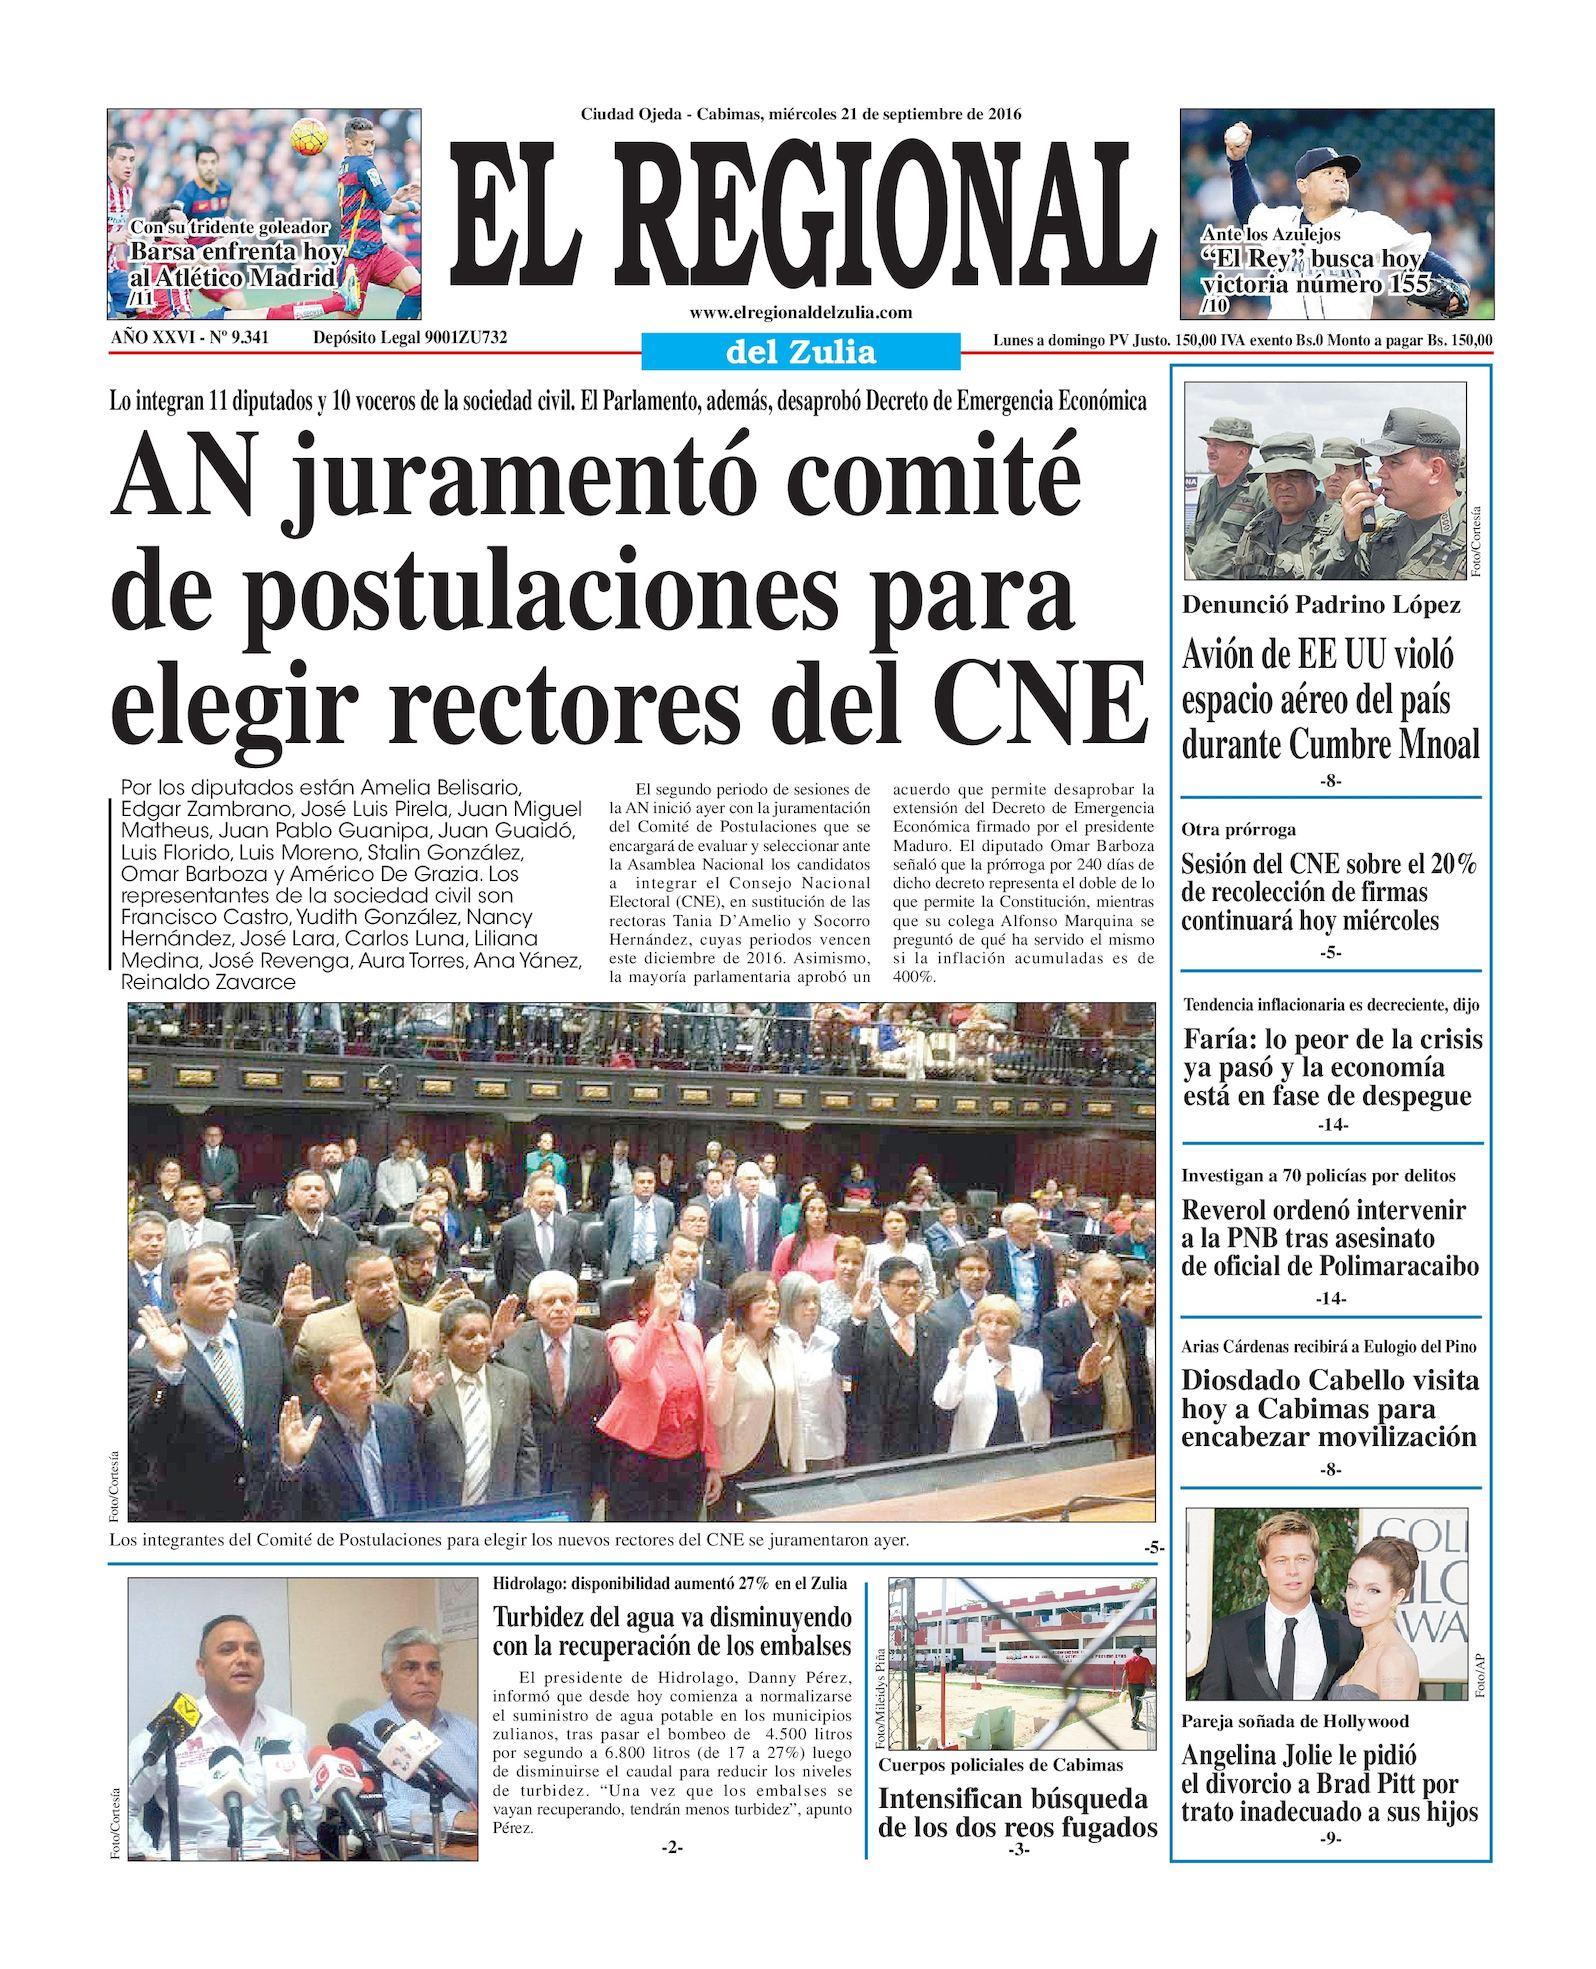 Calaméo - El Regional del Zulia 21-09-2016